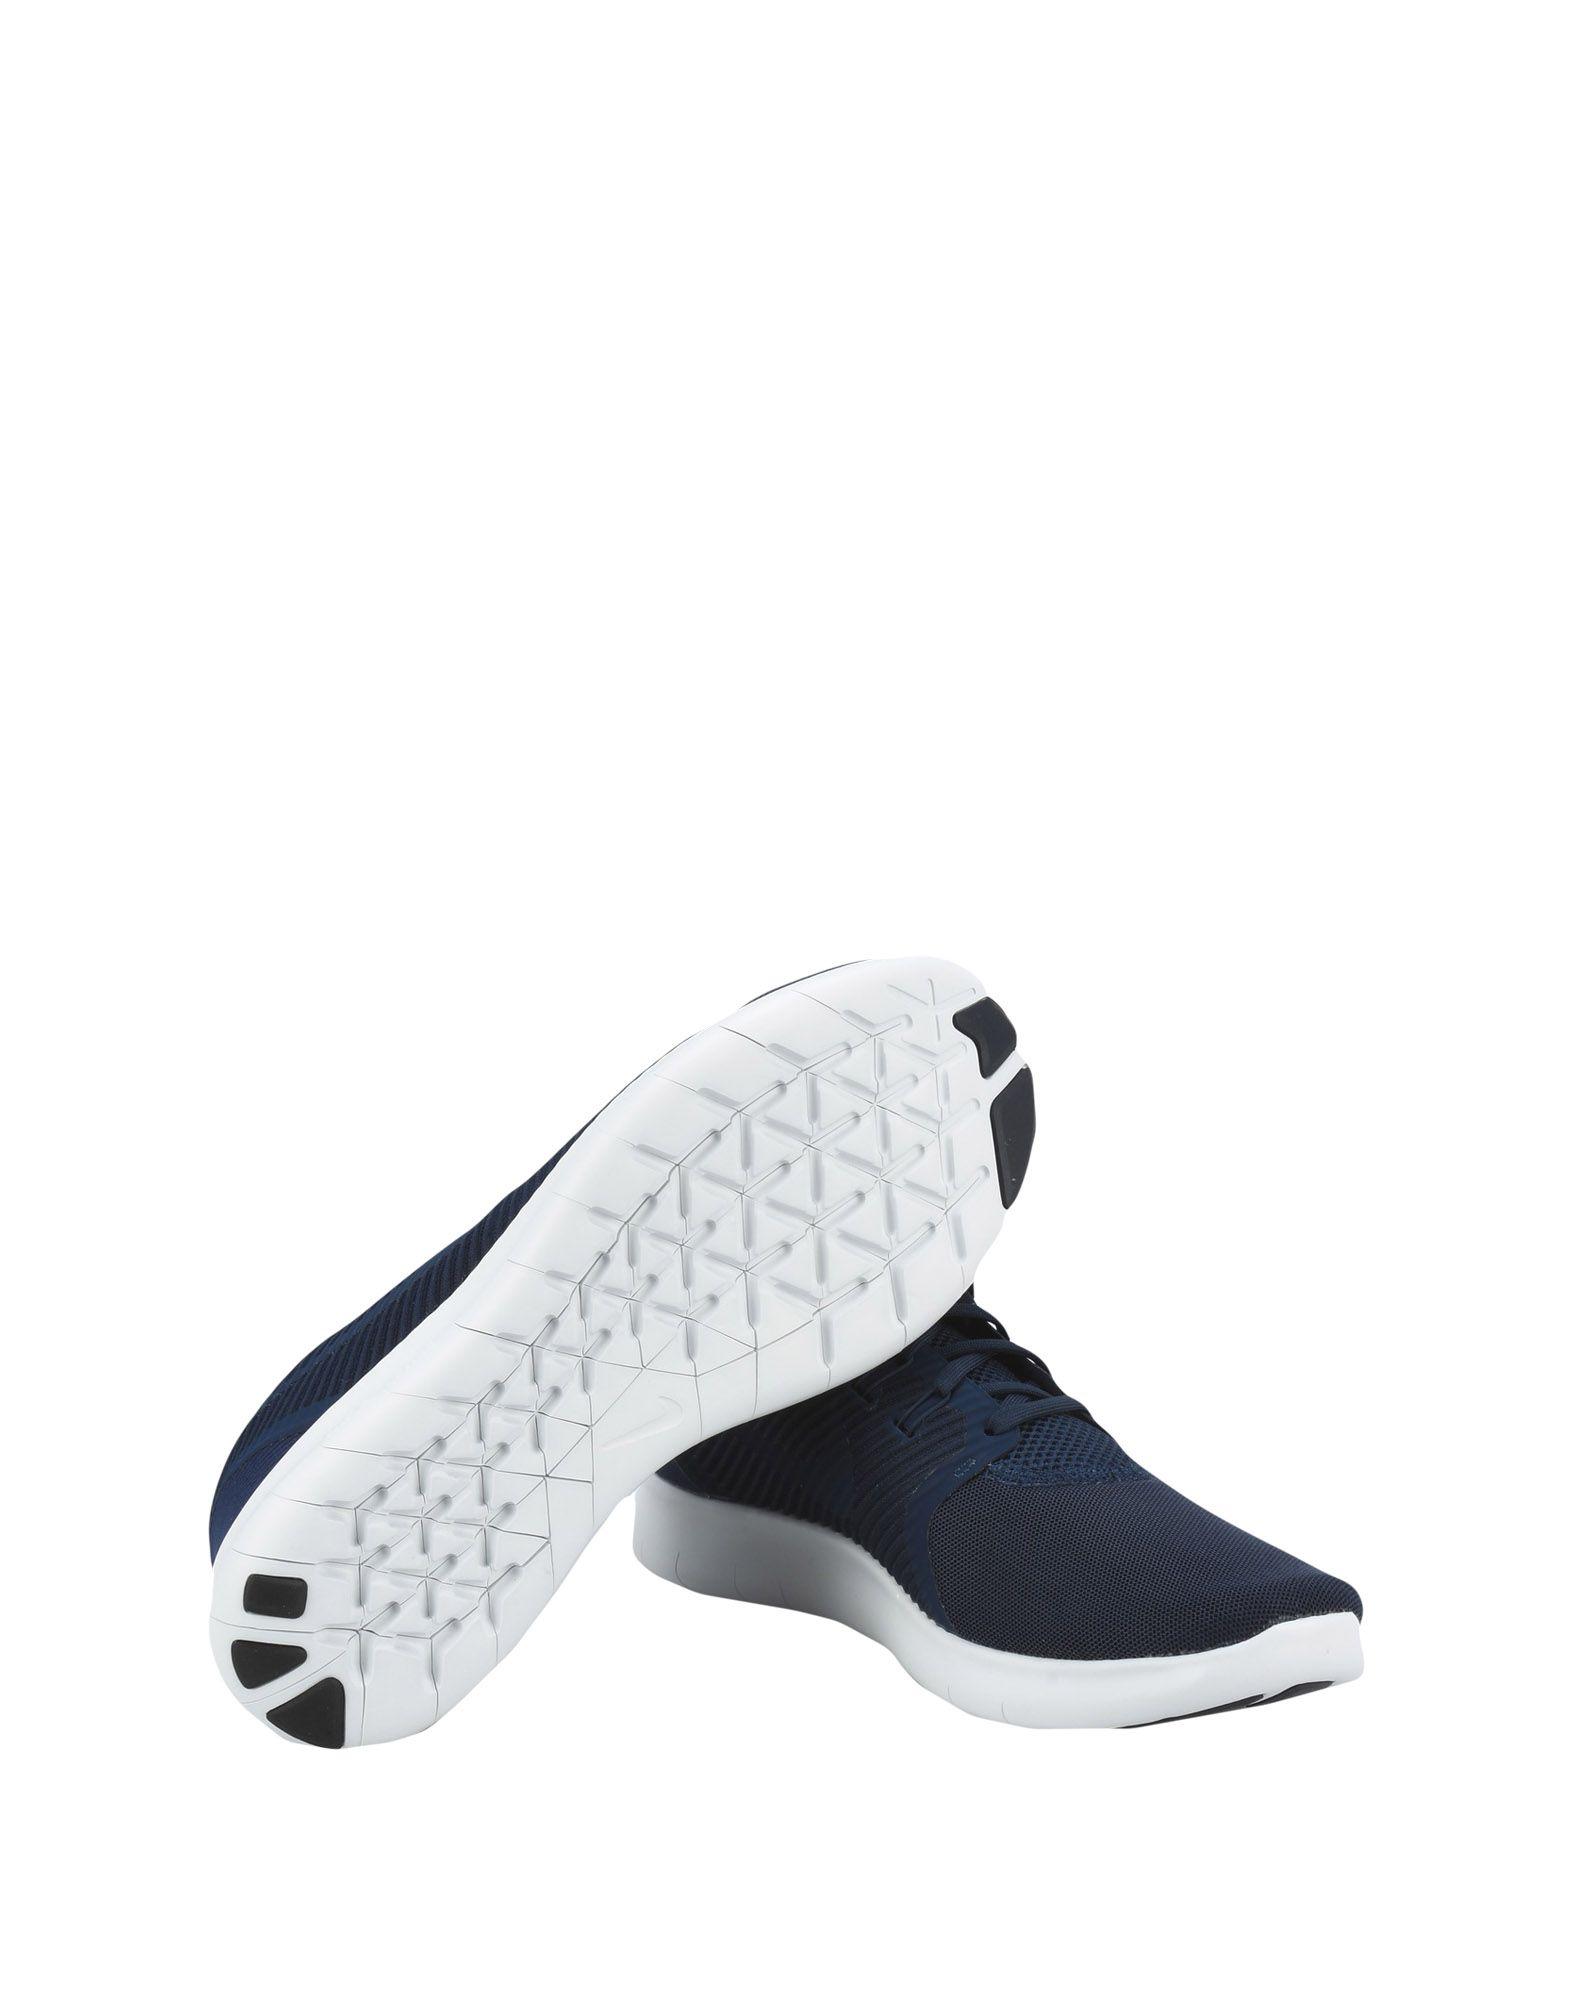 Sneakers Nike  Free Run Commuter - Homme - Sneakers Nike sur